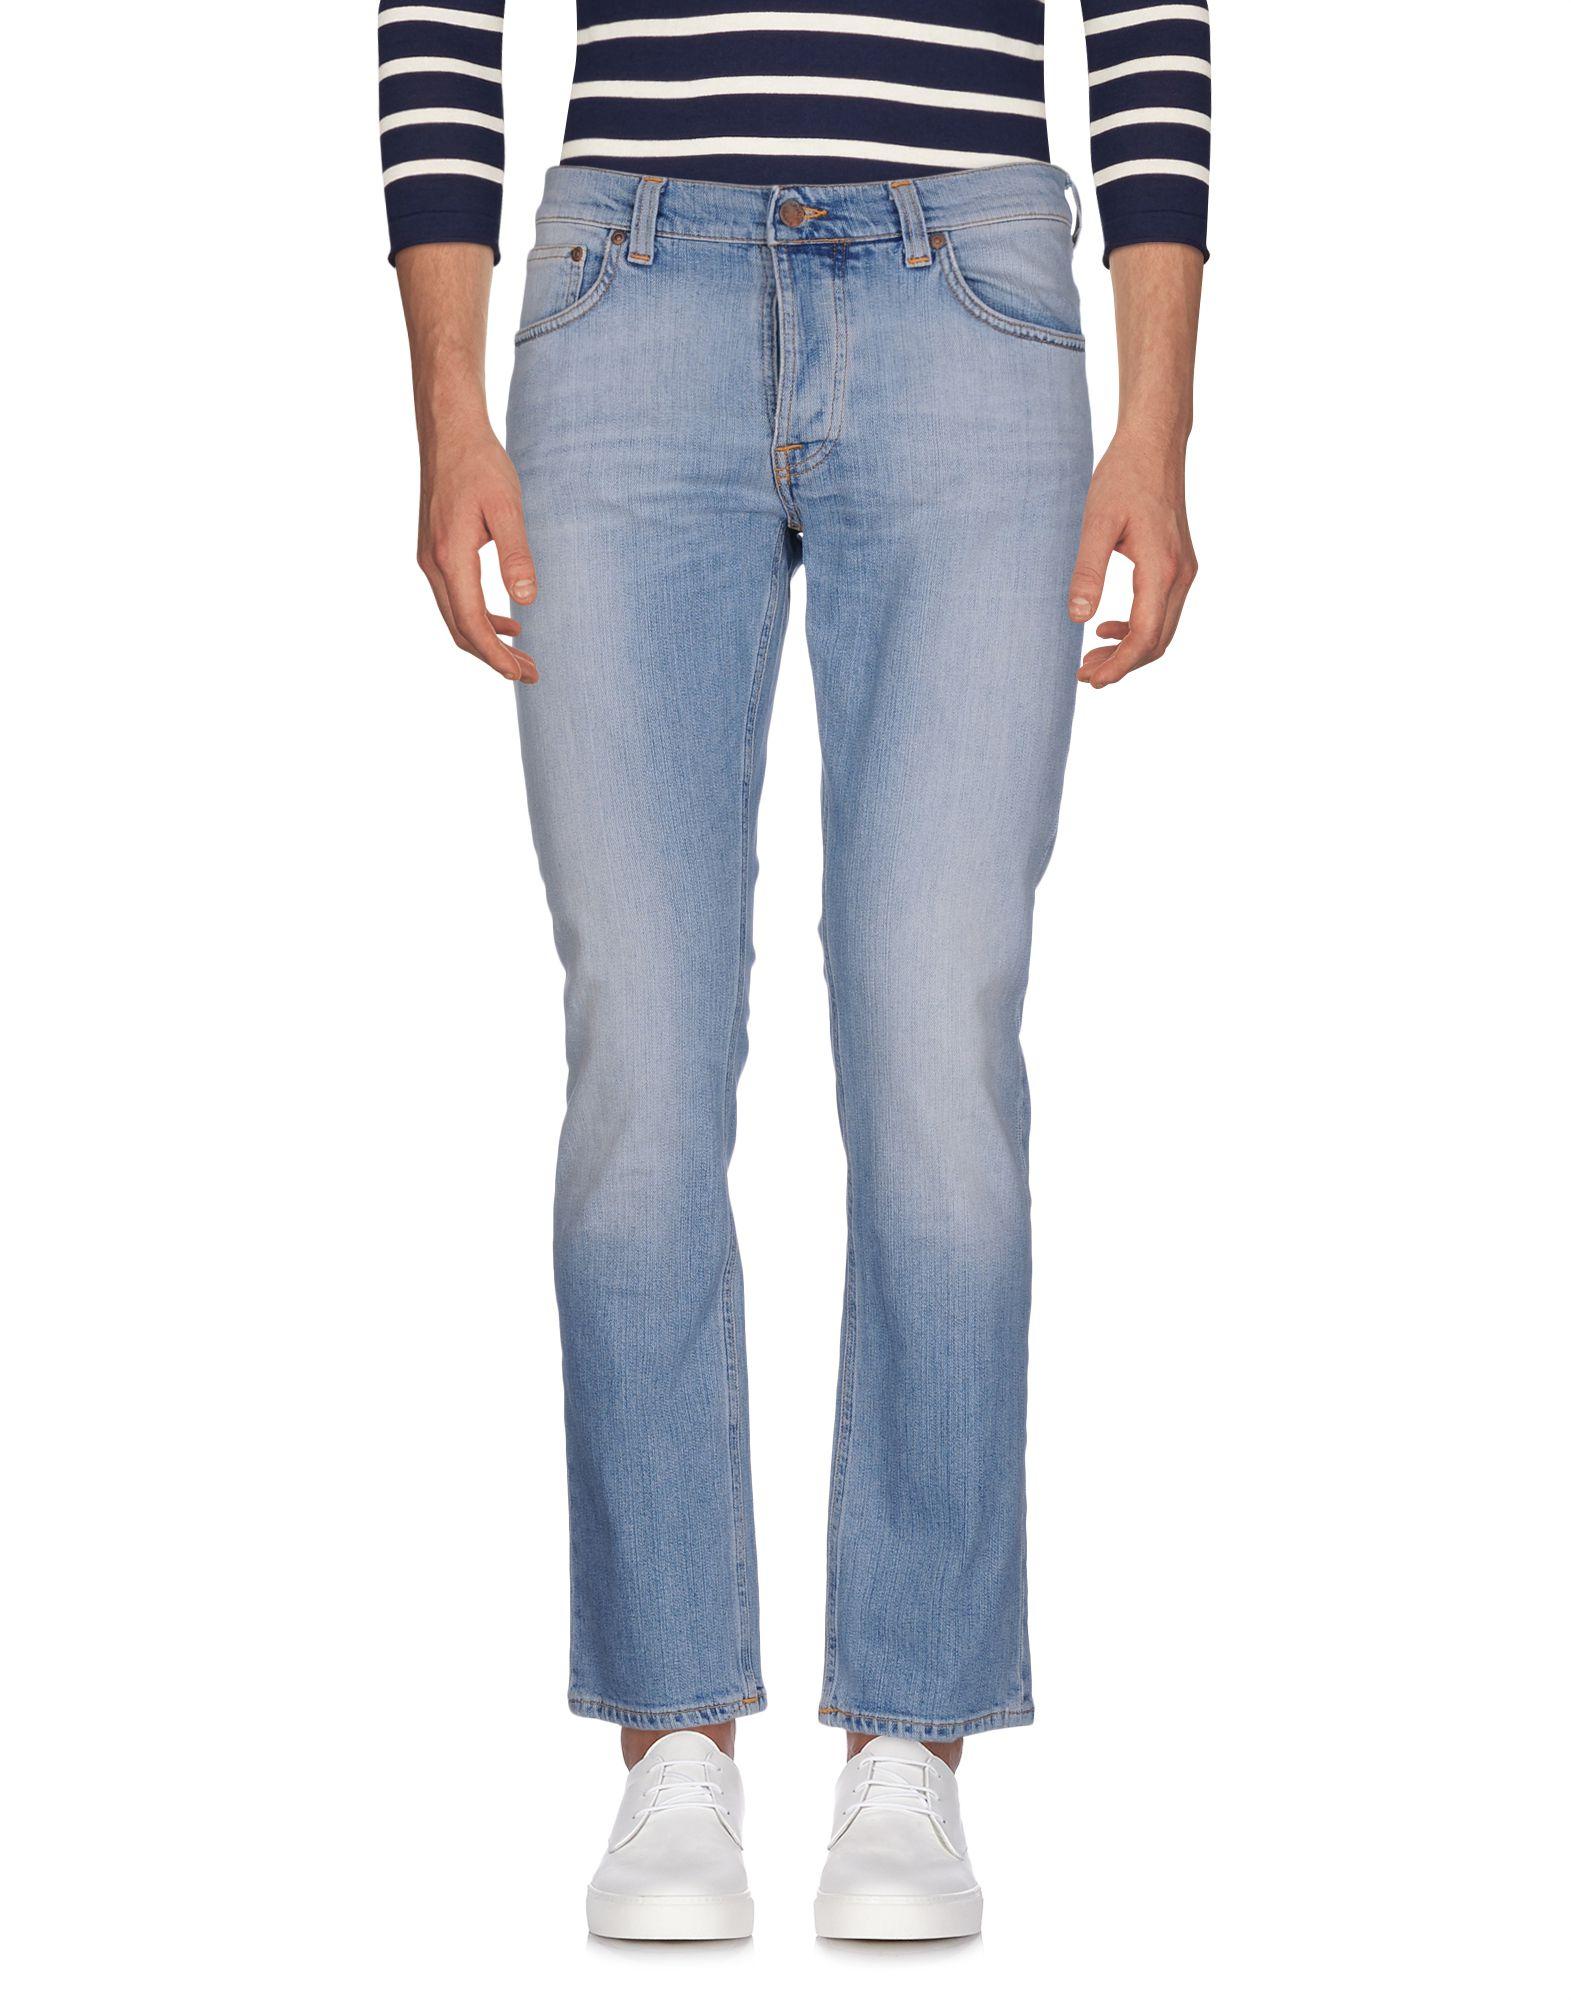 Pantaloni Jeans Nudie Jeans Co Uomo - 42627942DK